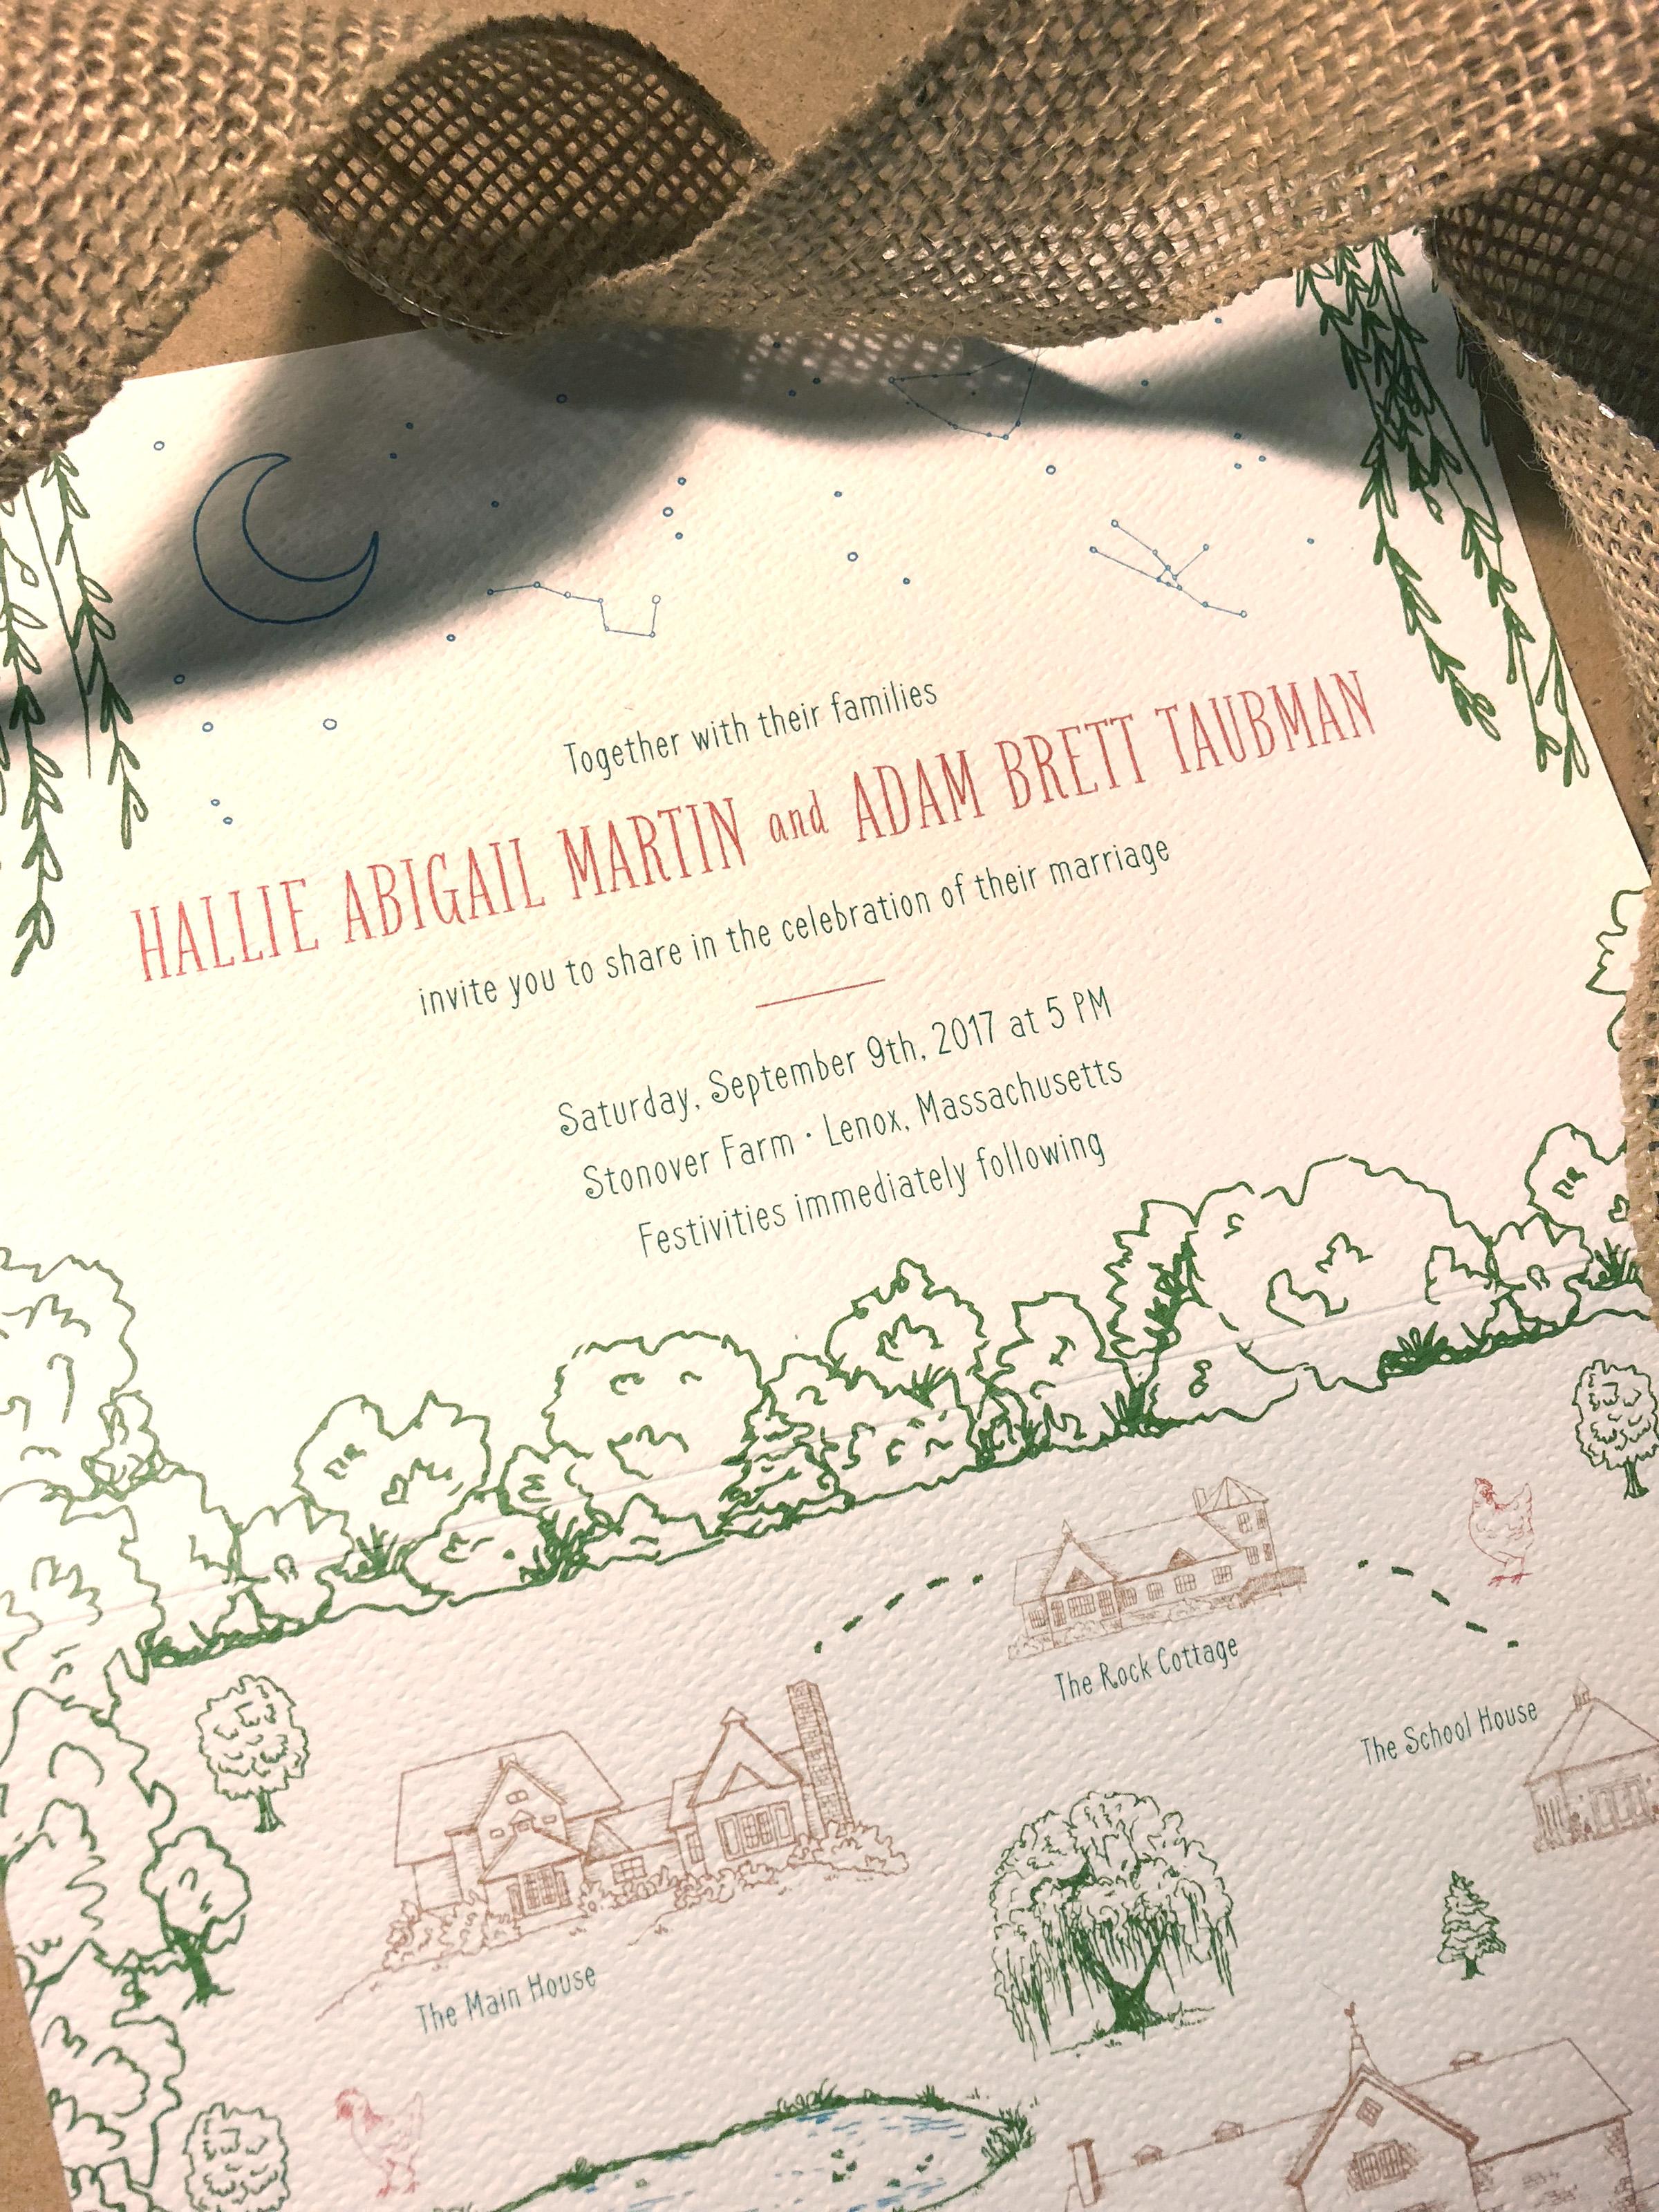 martin invite 2.JPG